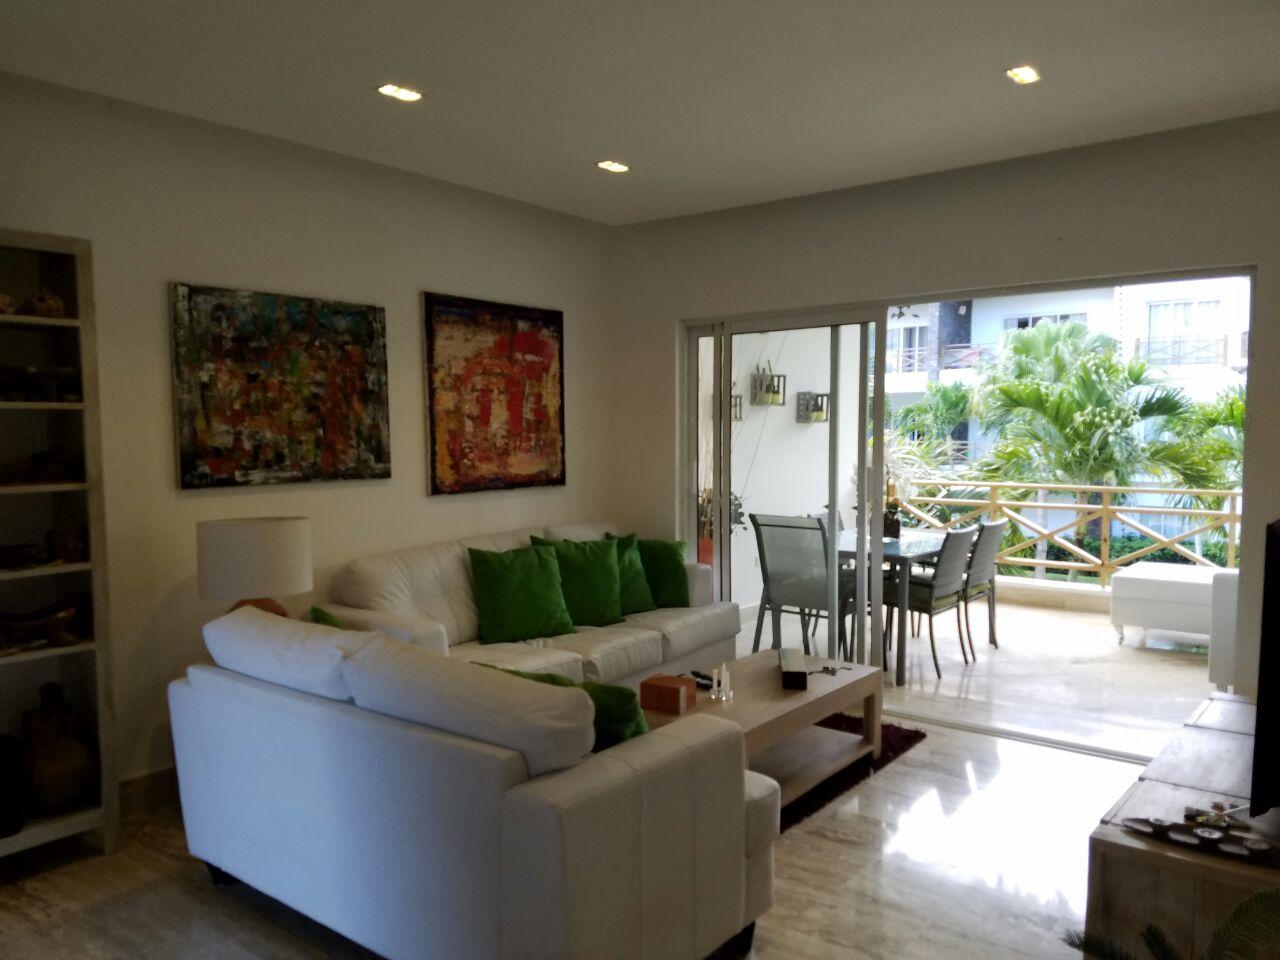 Apartment for sale las terrenas monserrat II living room view.jpeg